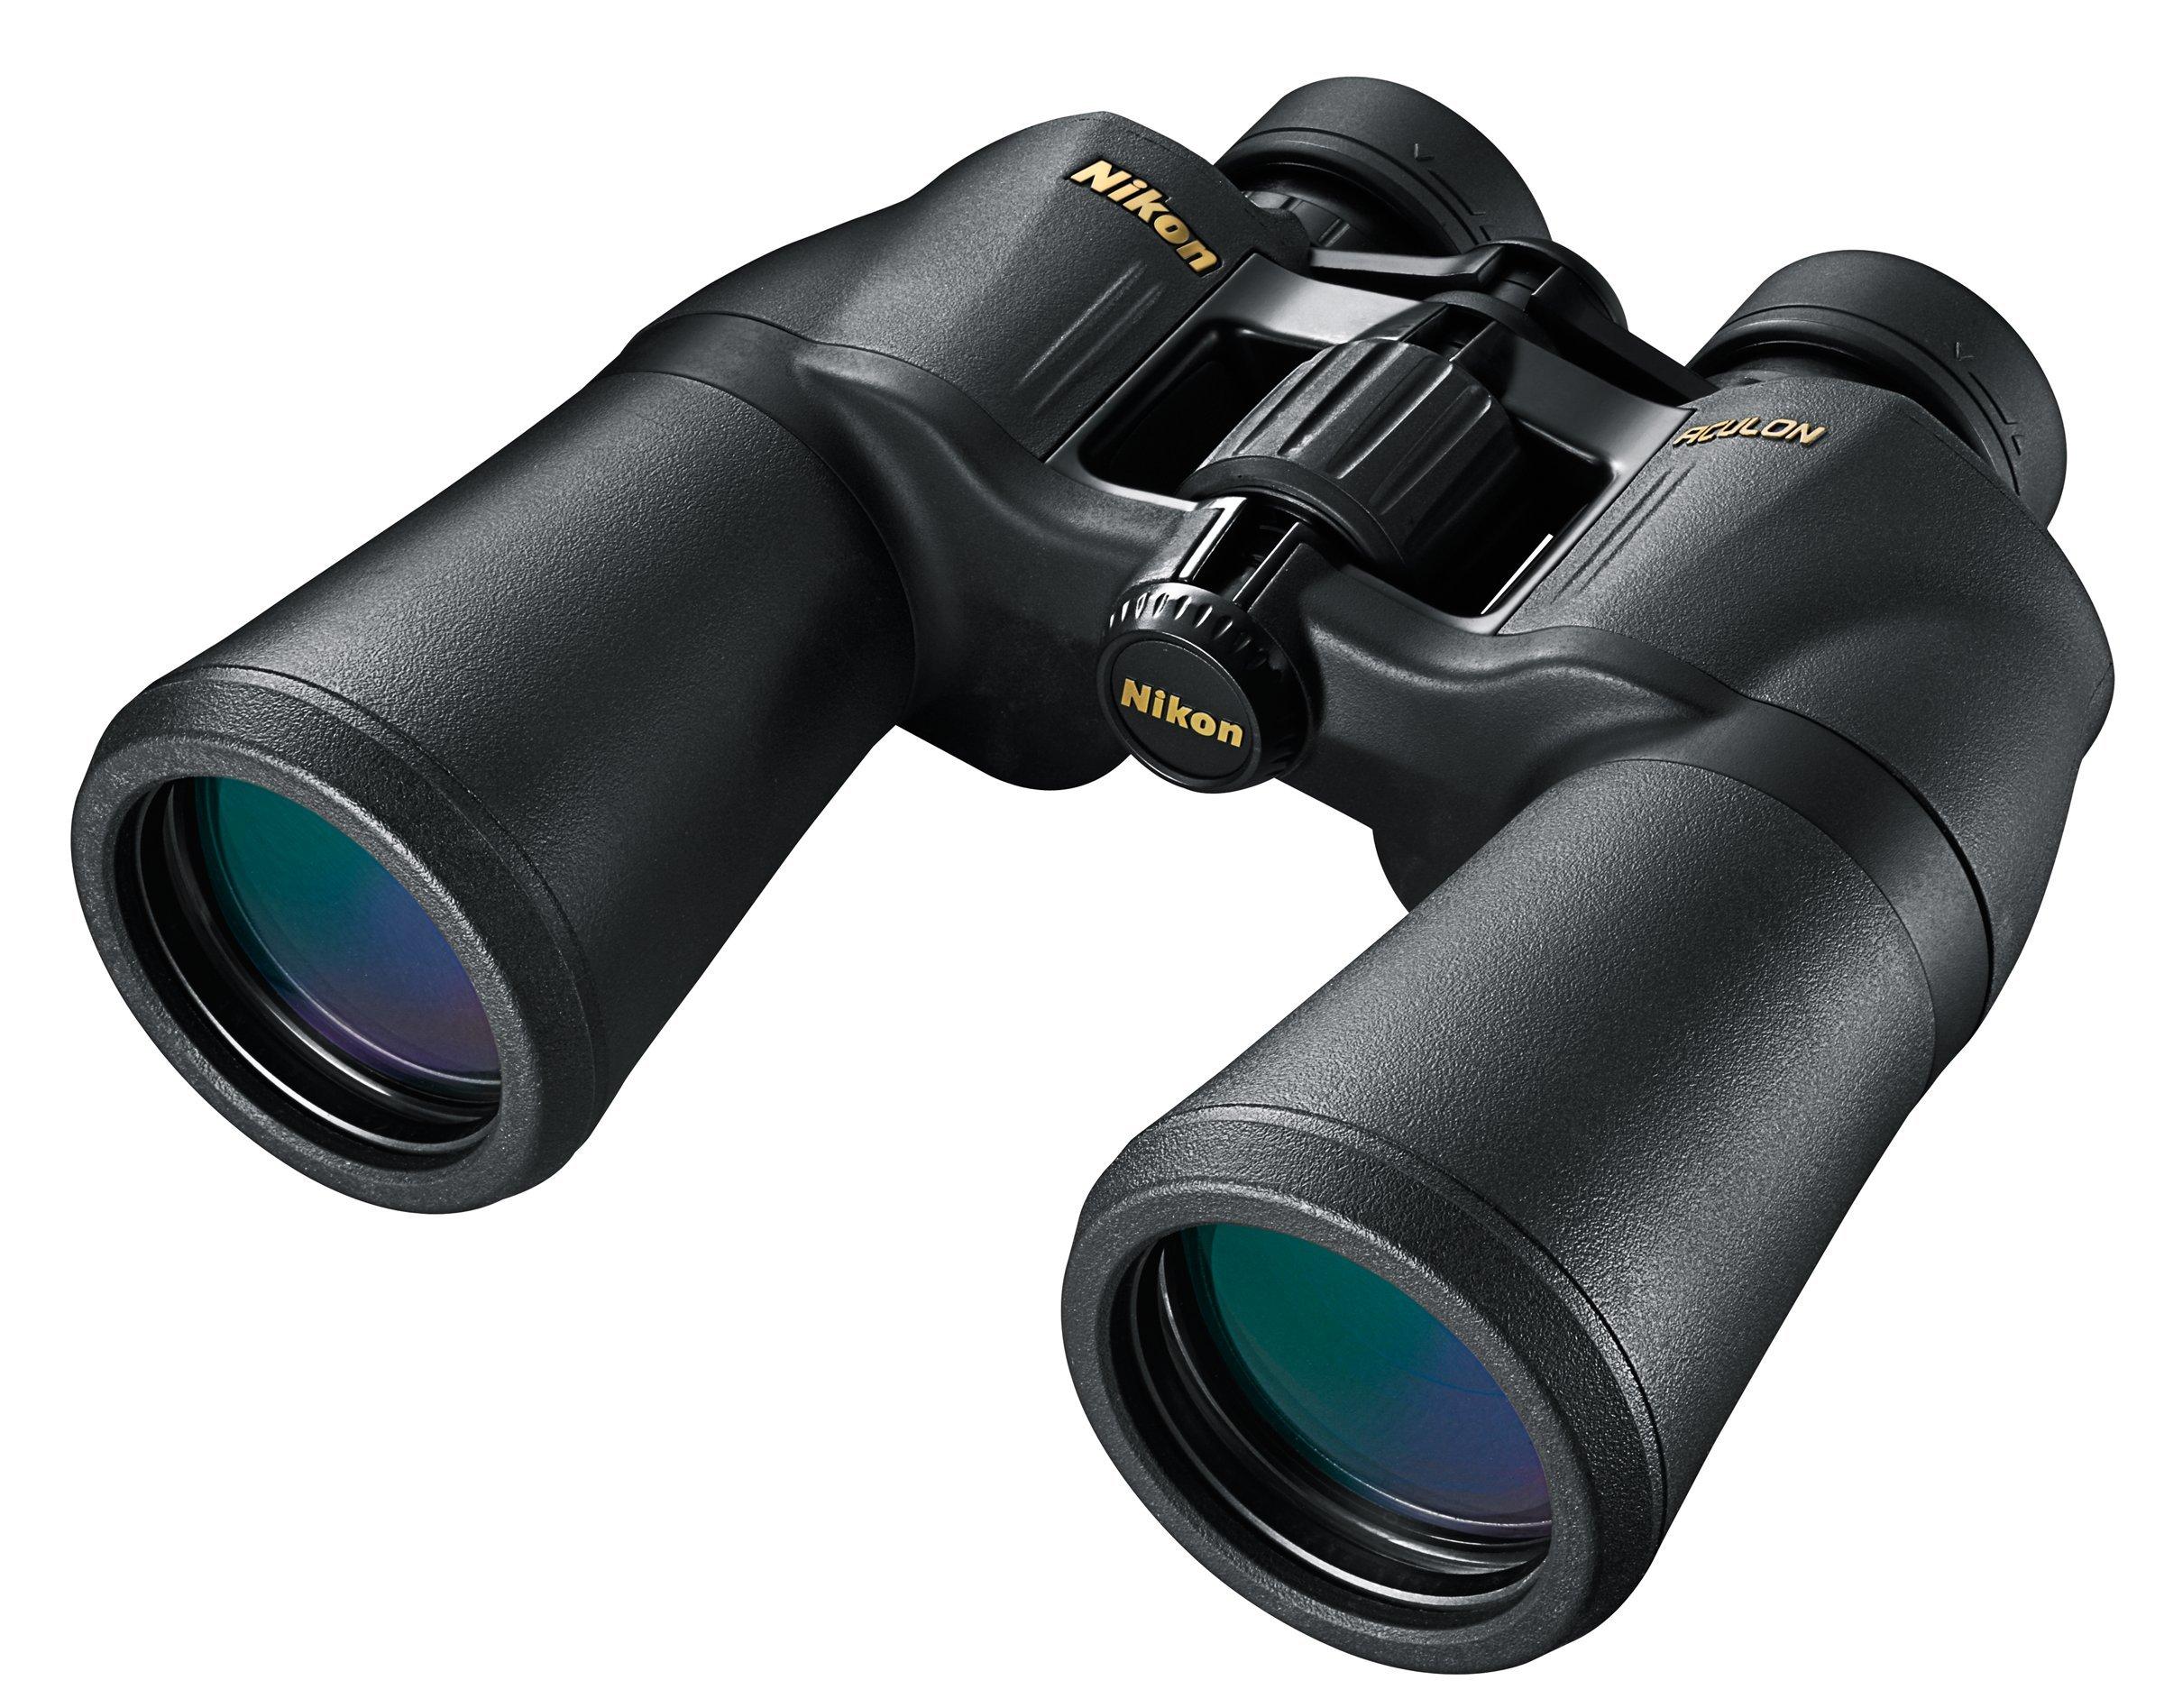 Jumelles NIKON A211 12x50 ultra lumineuse et robuste product image